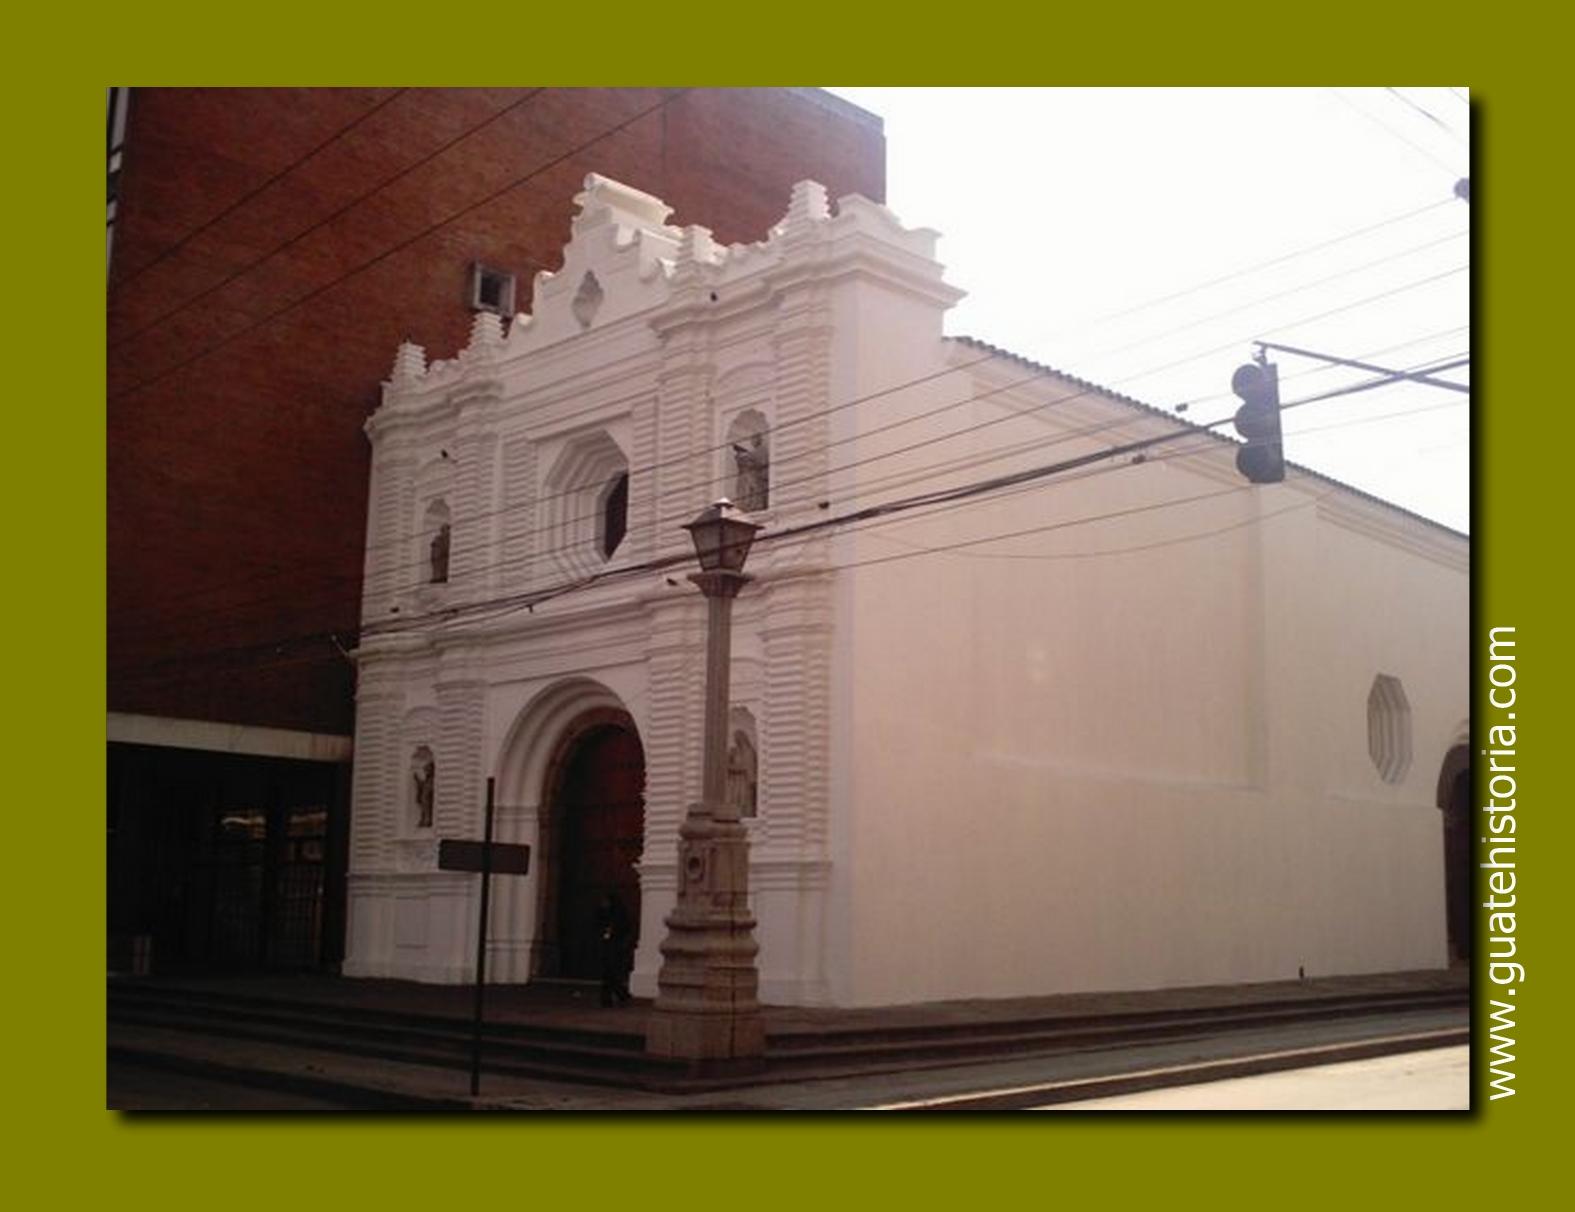 IGLESIA DE SAN MIGUEL DE CAPUCHINAS